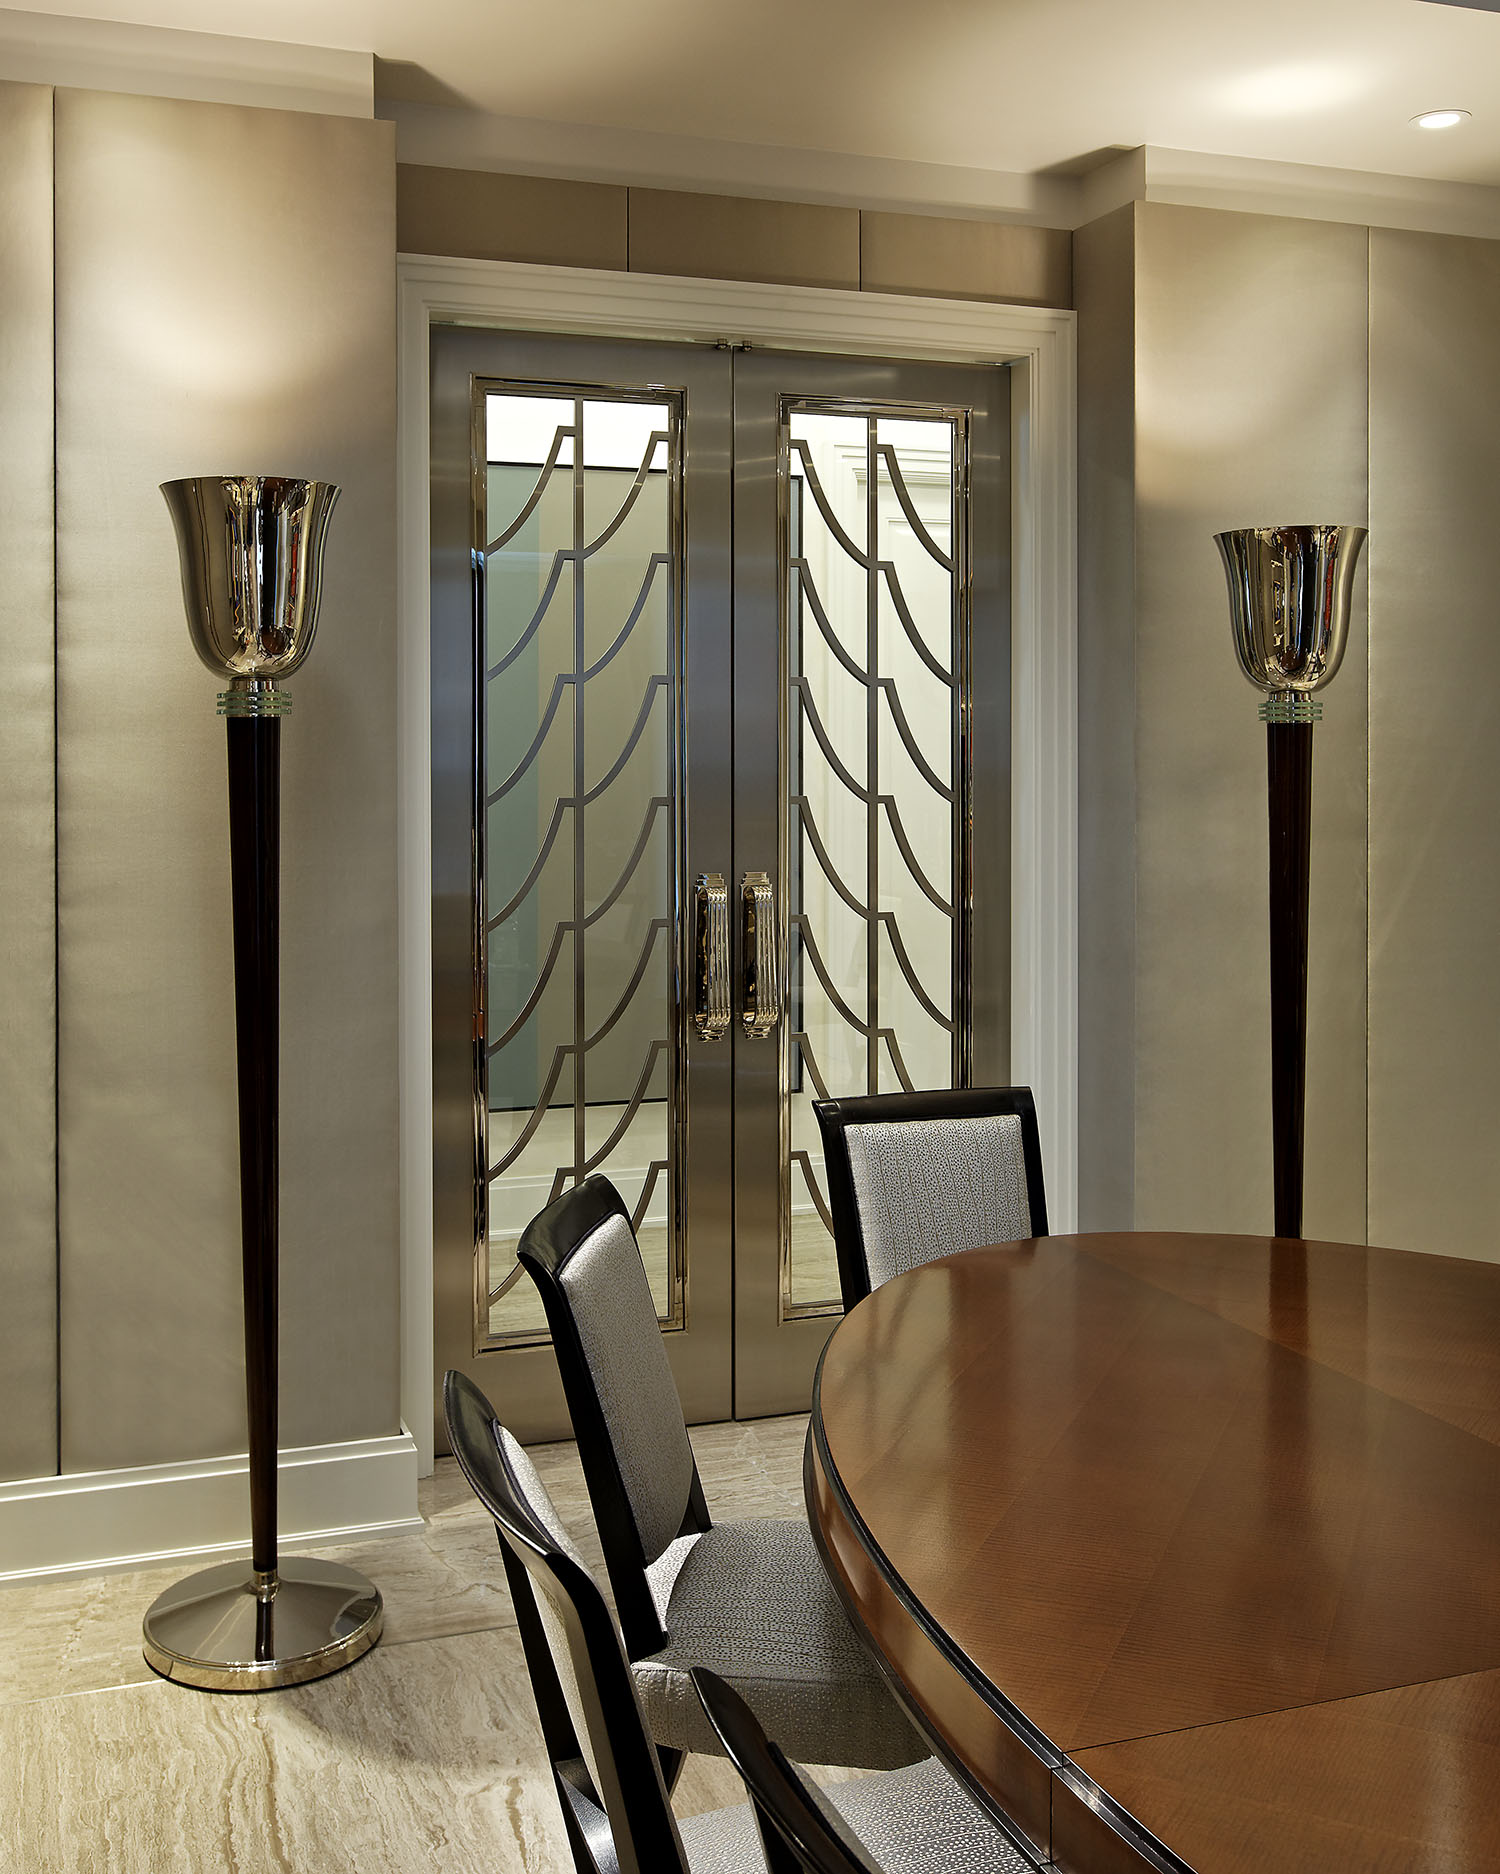 10_Dining Room Doors.jpg